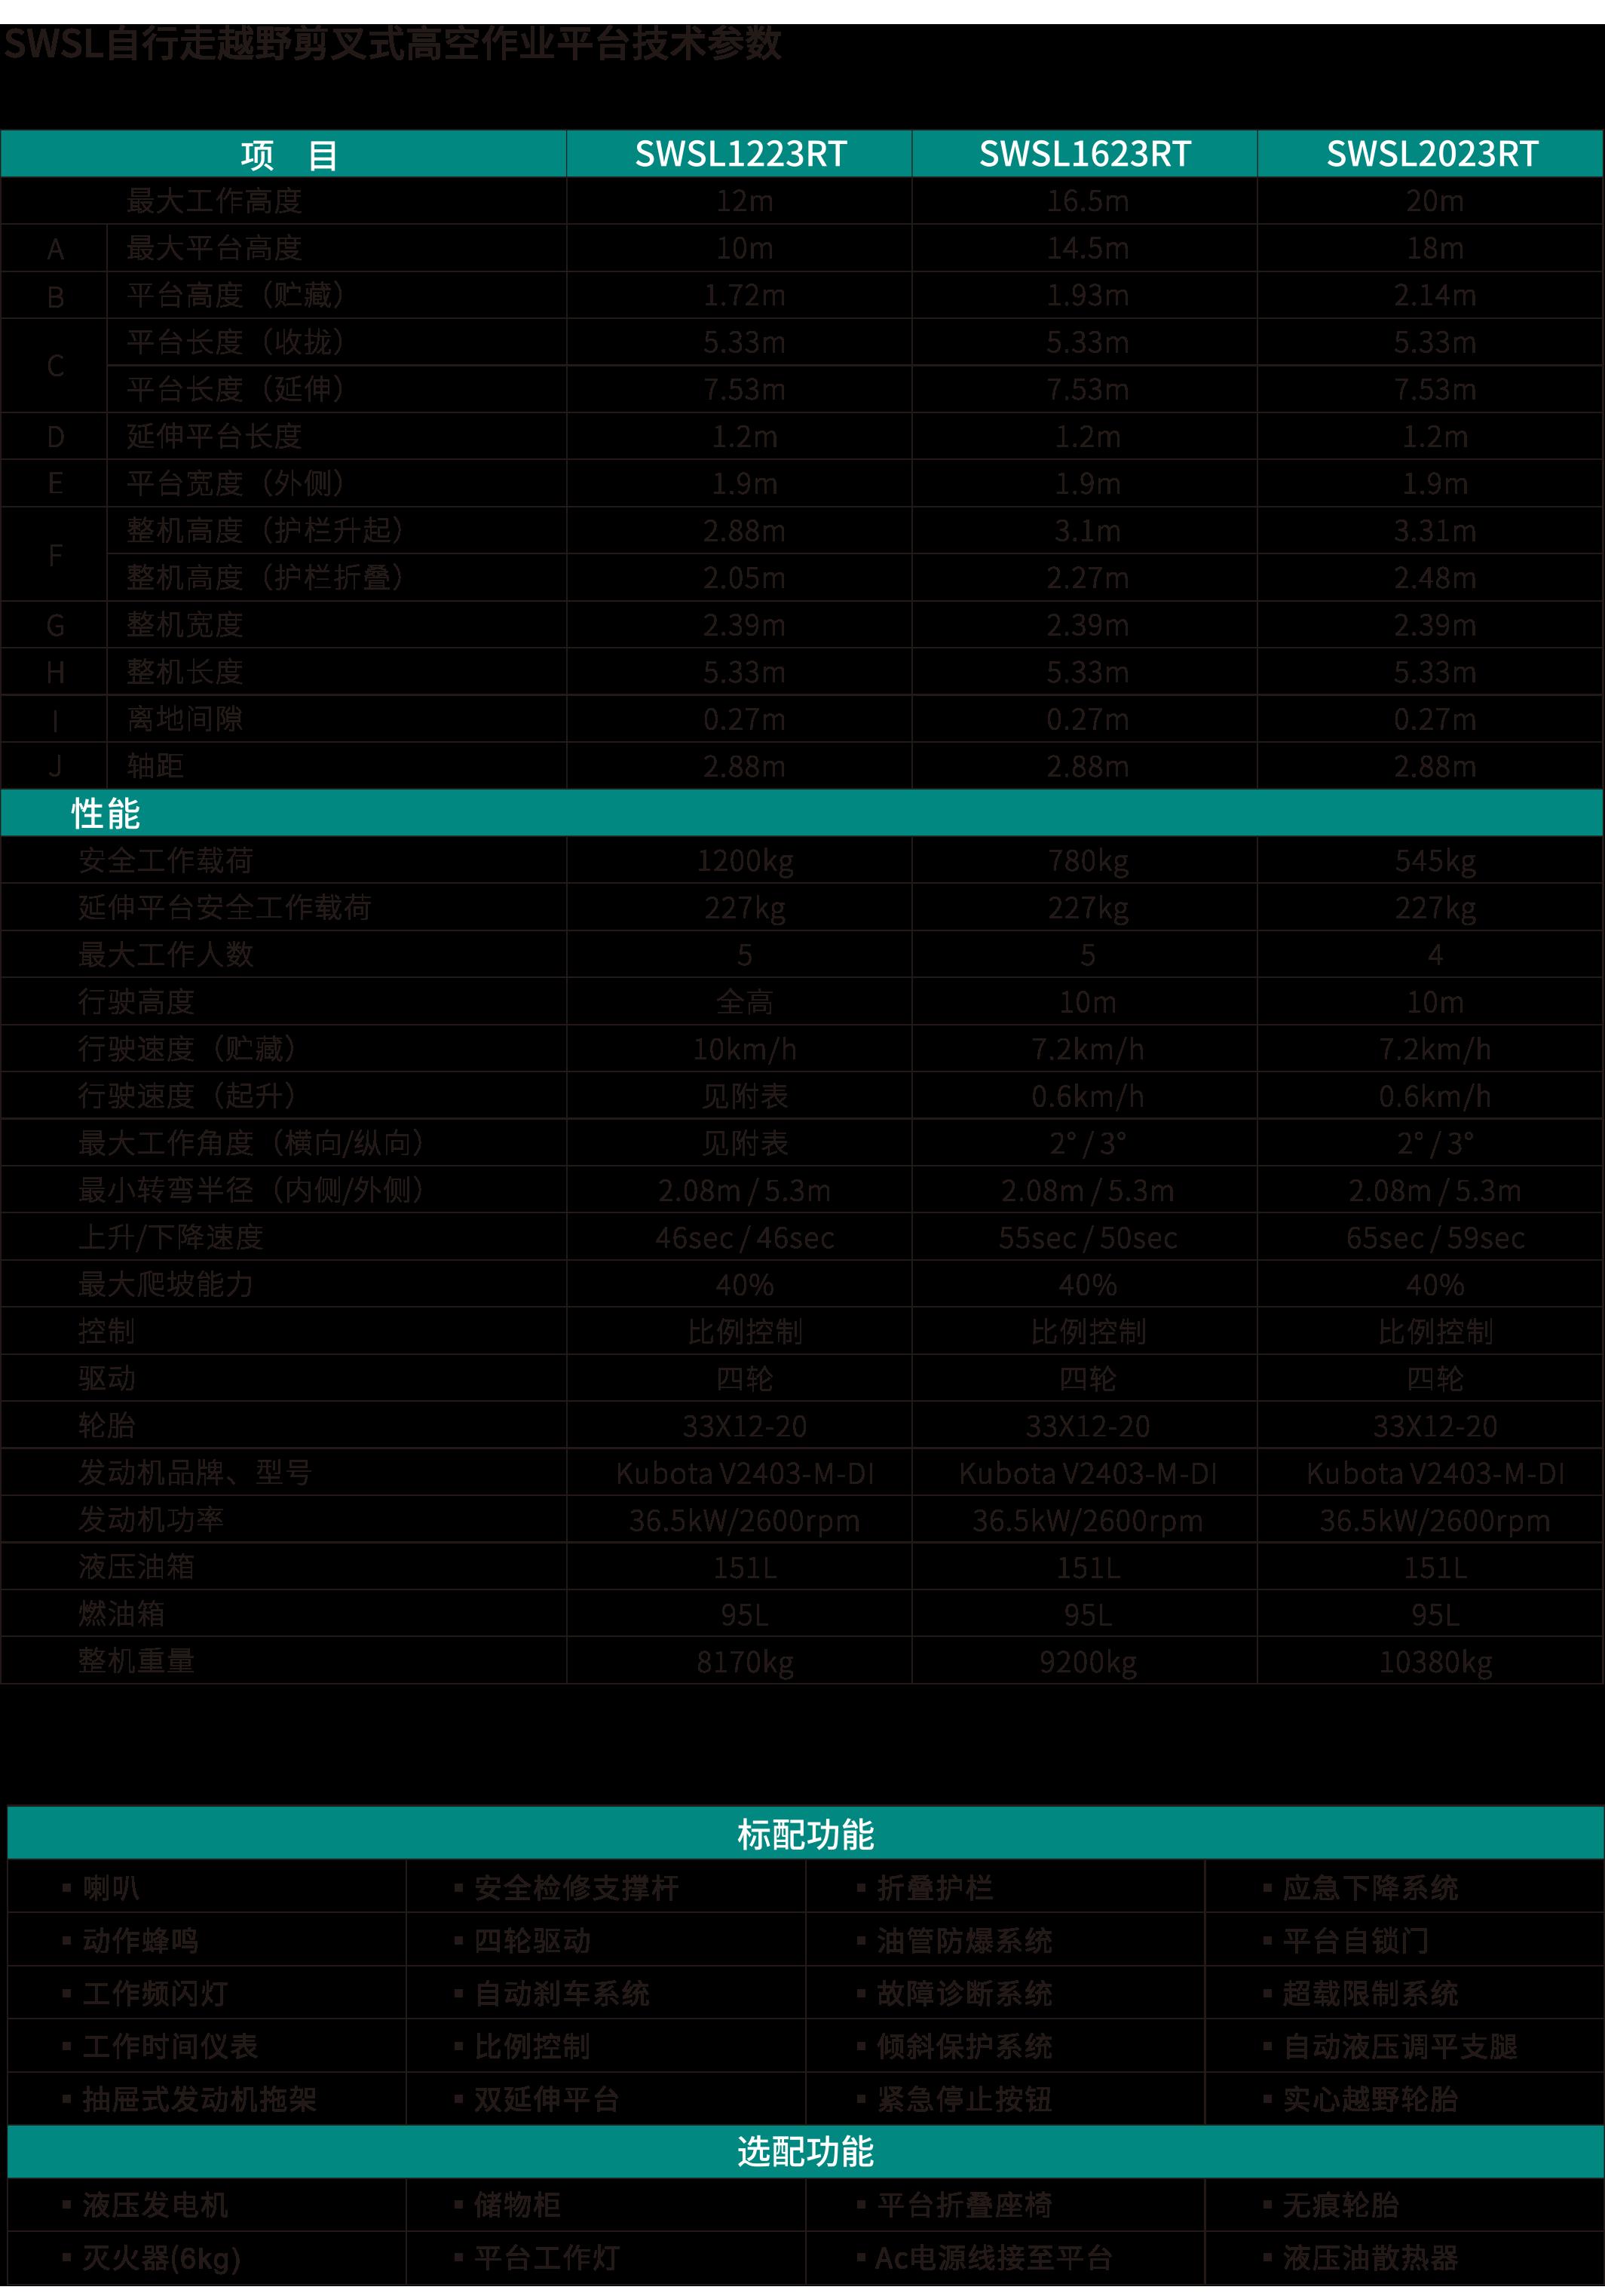 SWSL1223RT 越野剪叉式高空作业平台